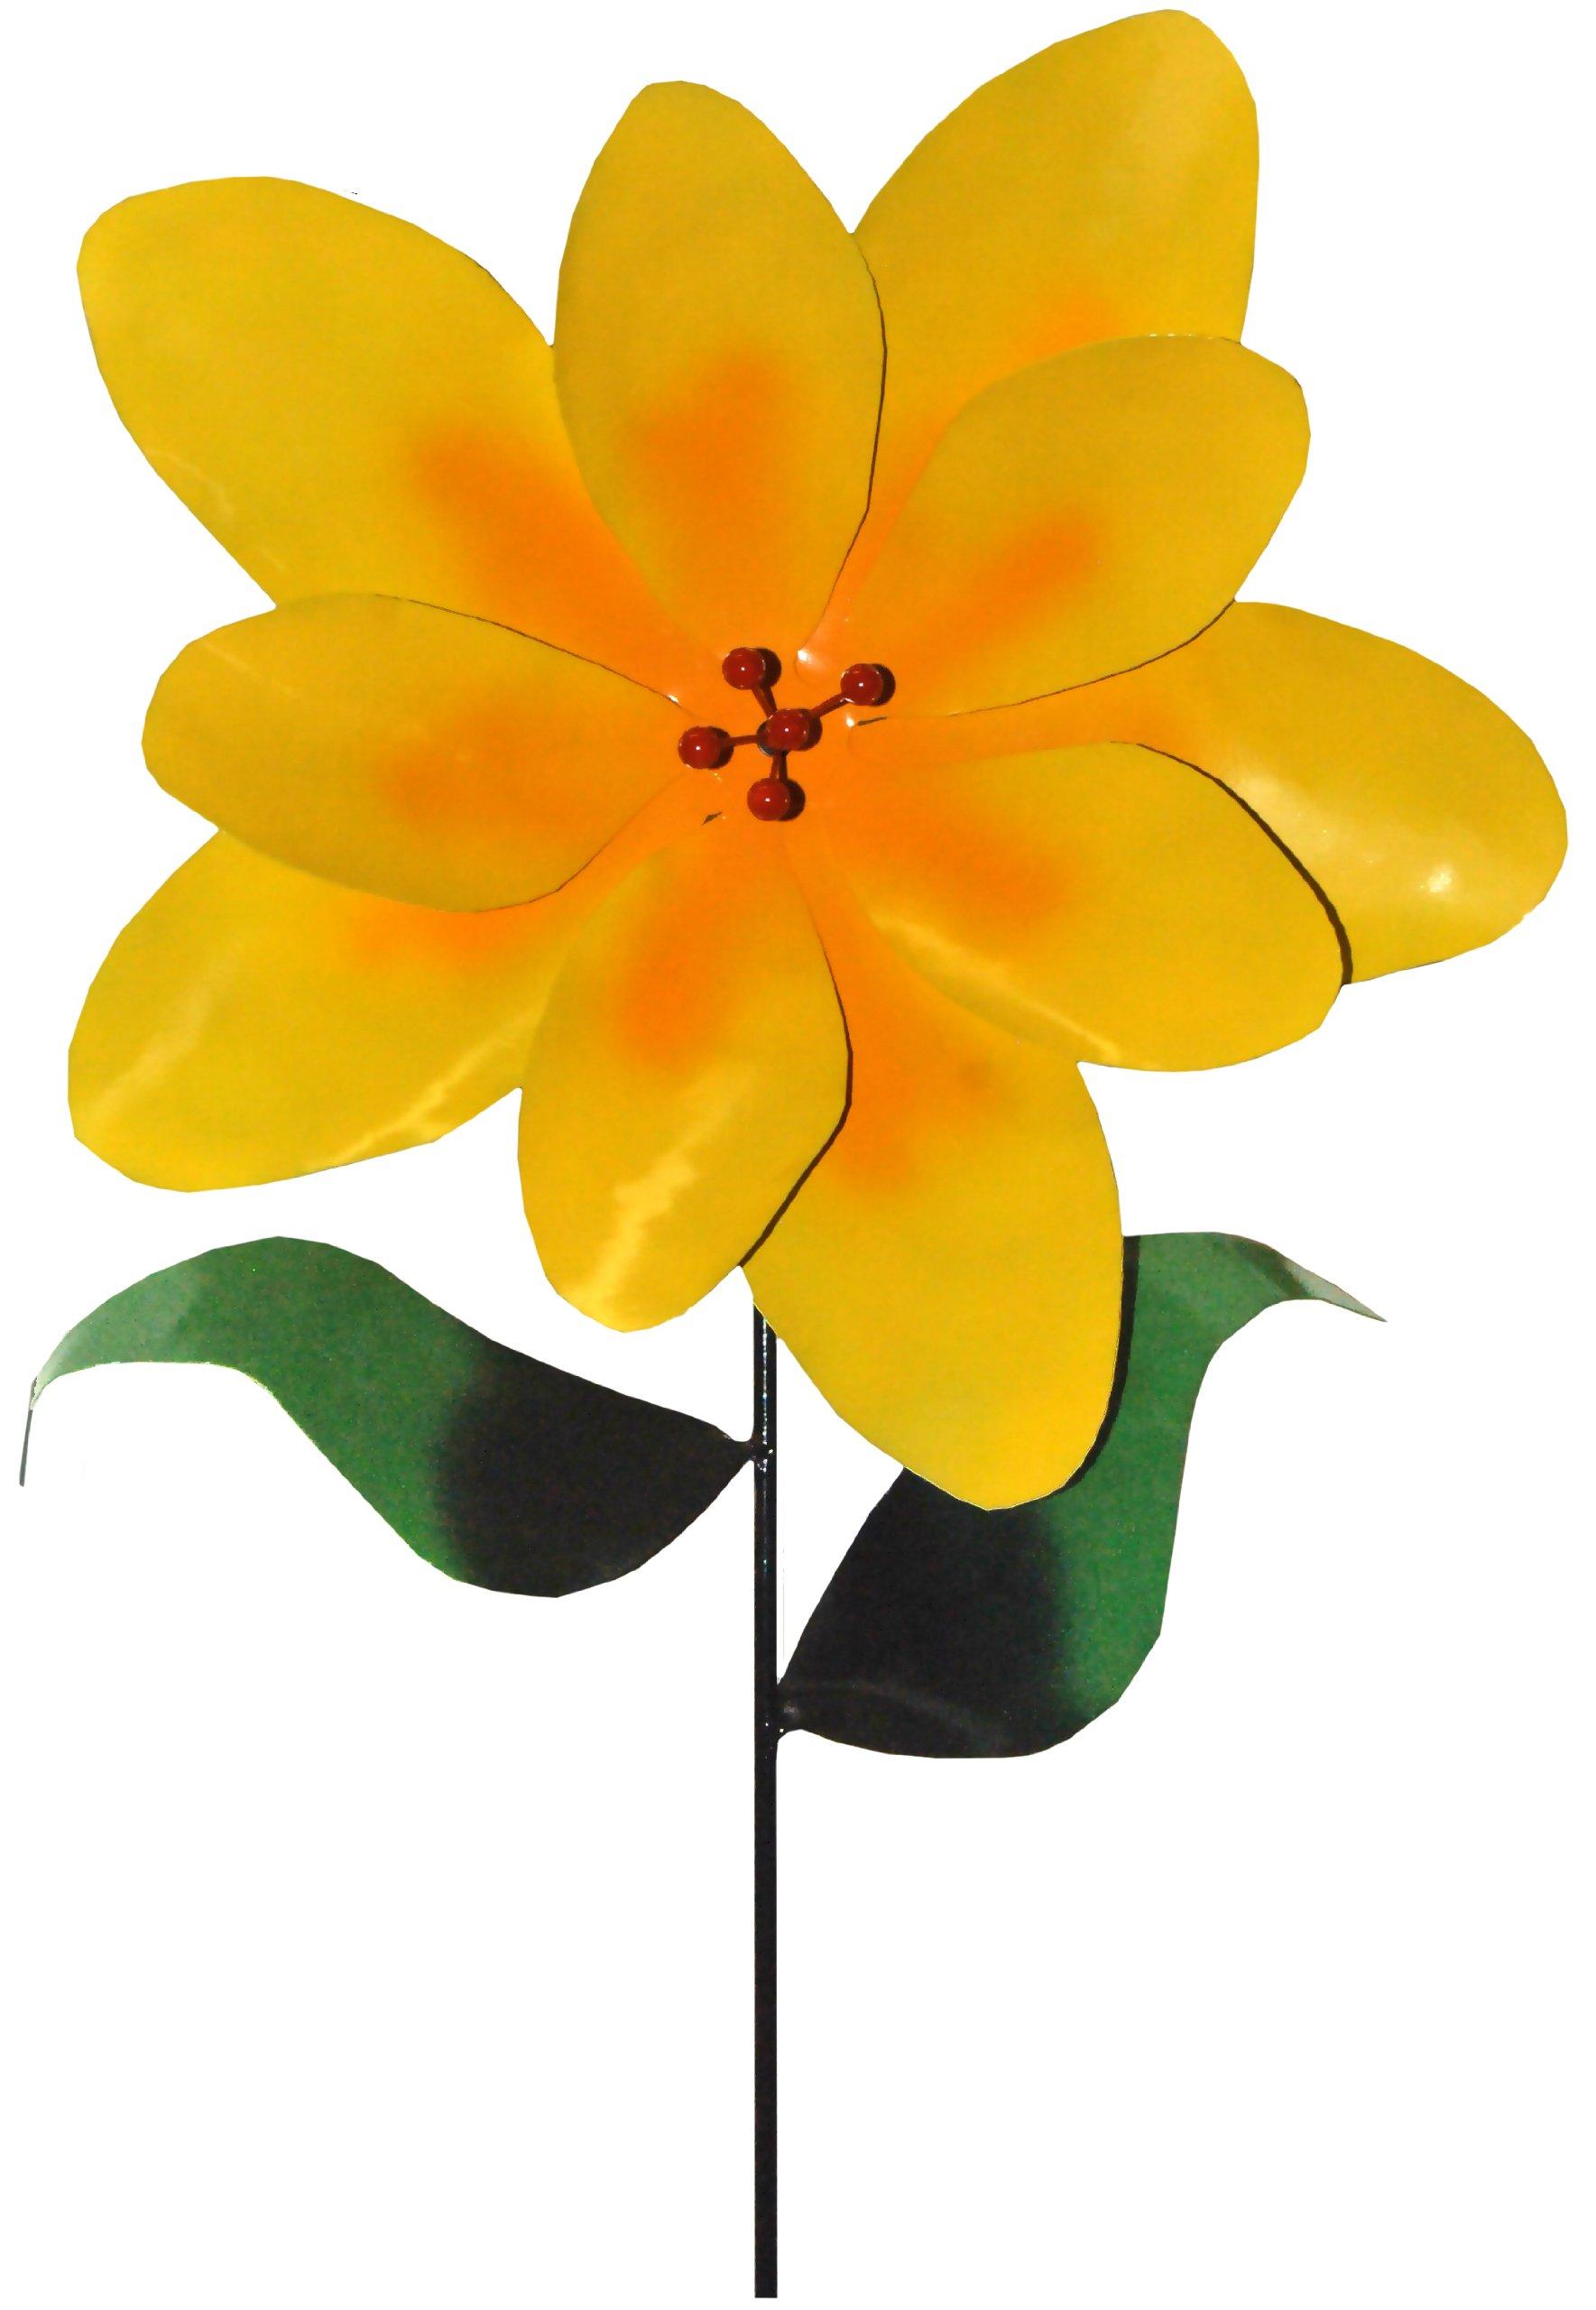 Steven Cooper Metalsmith AFLWR-18-XL Artificial Garden Flower on Footed Stake, 6-Feet, Yellow